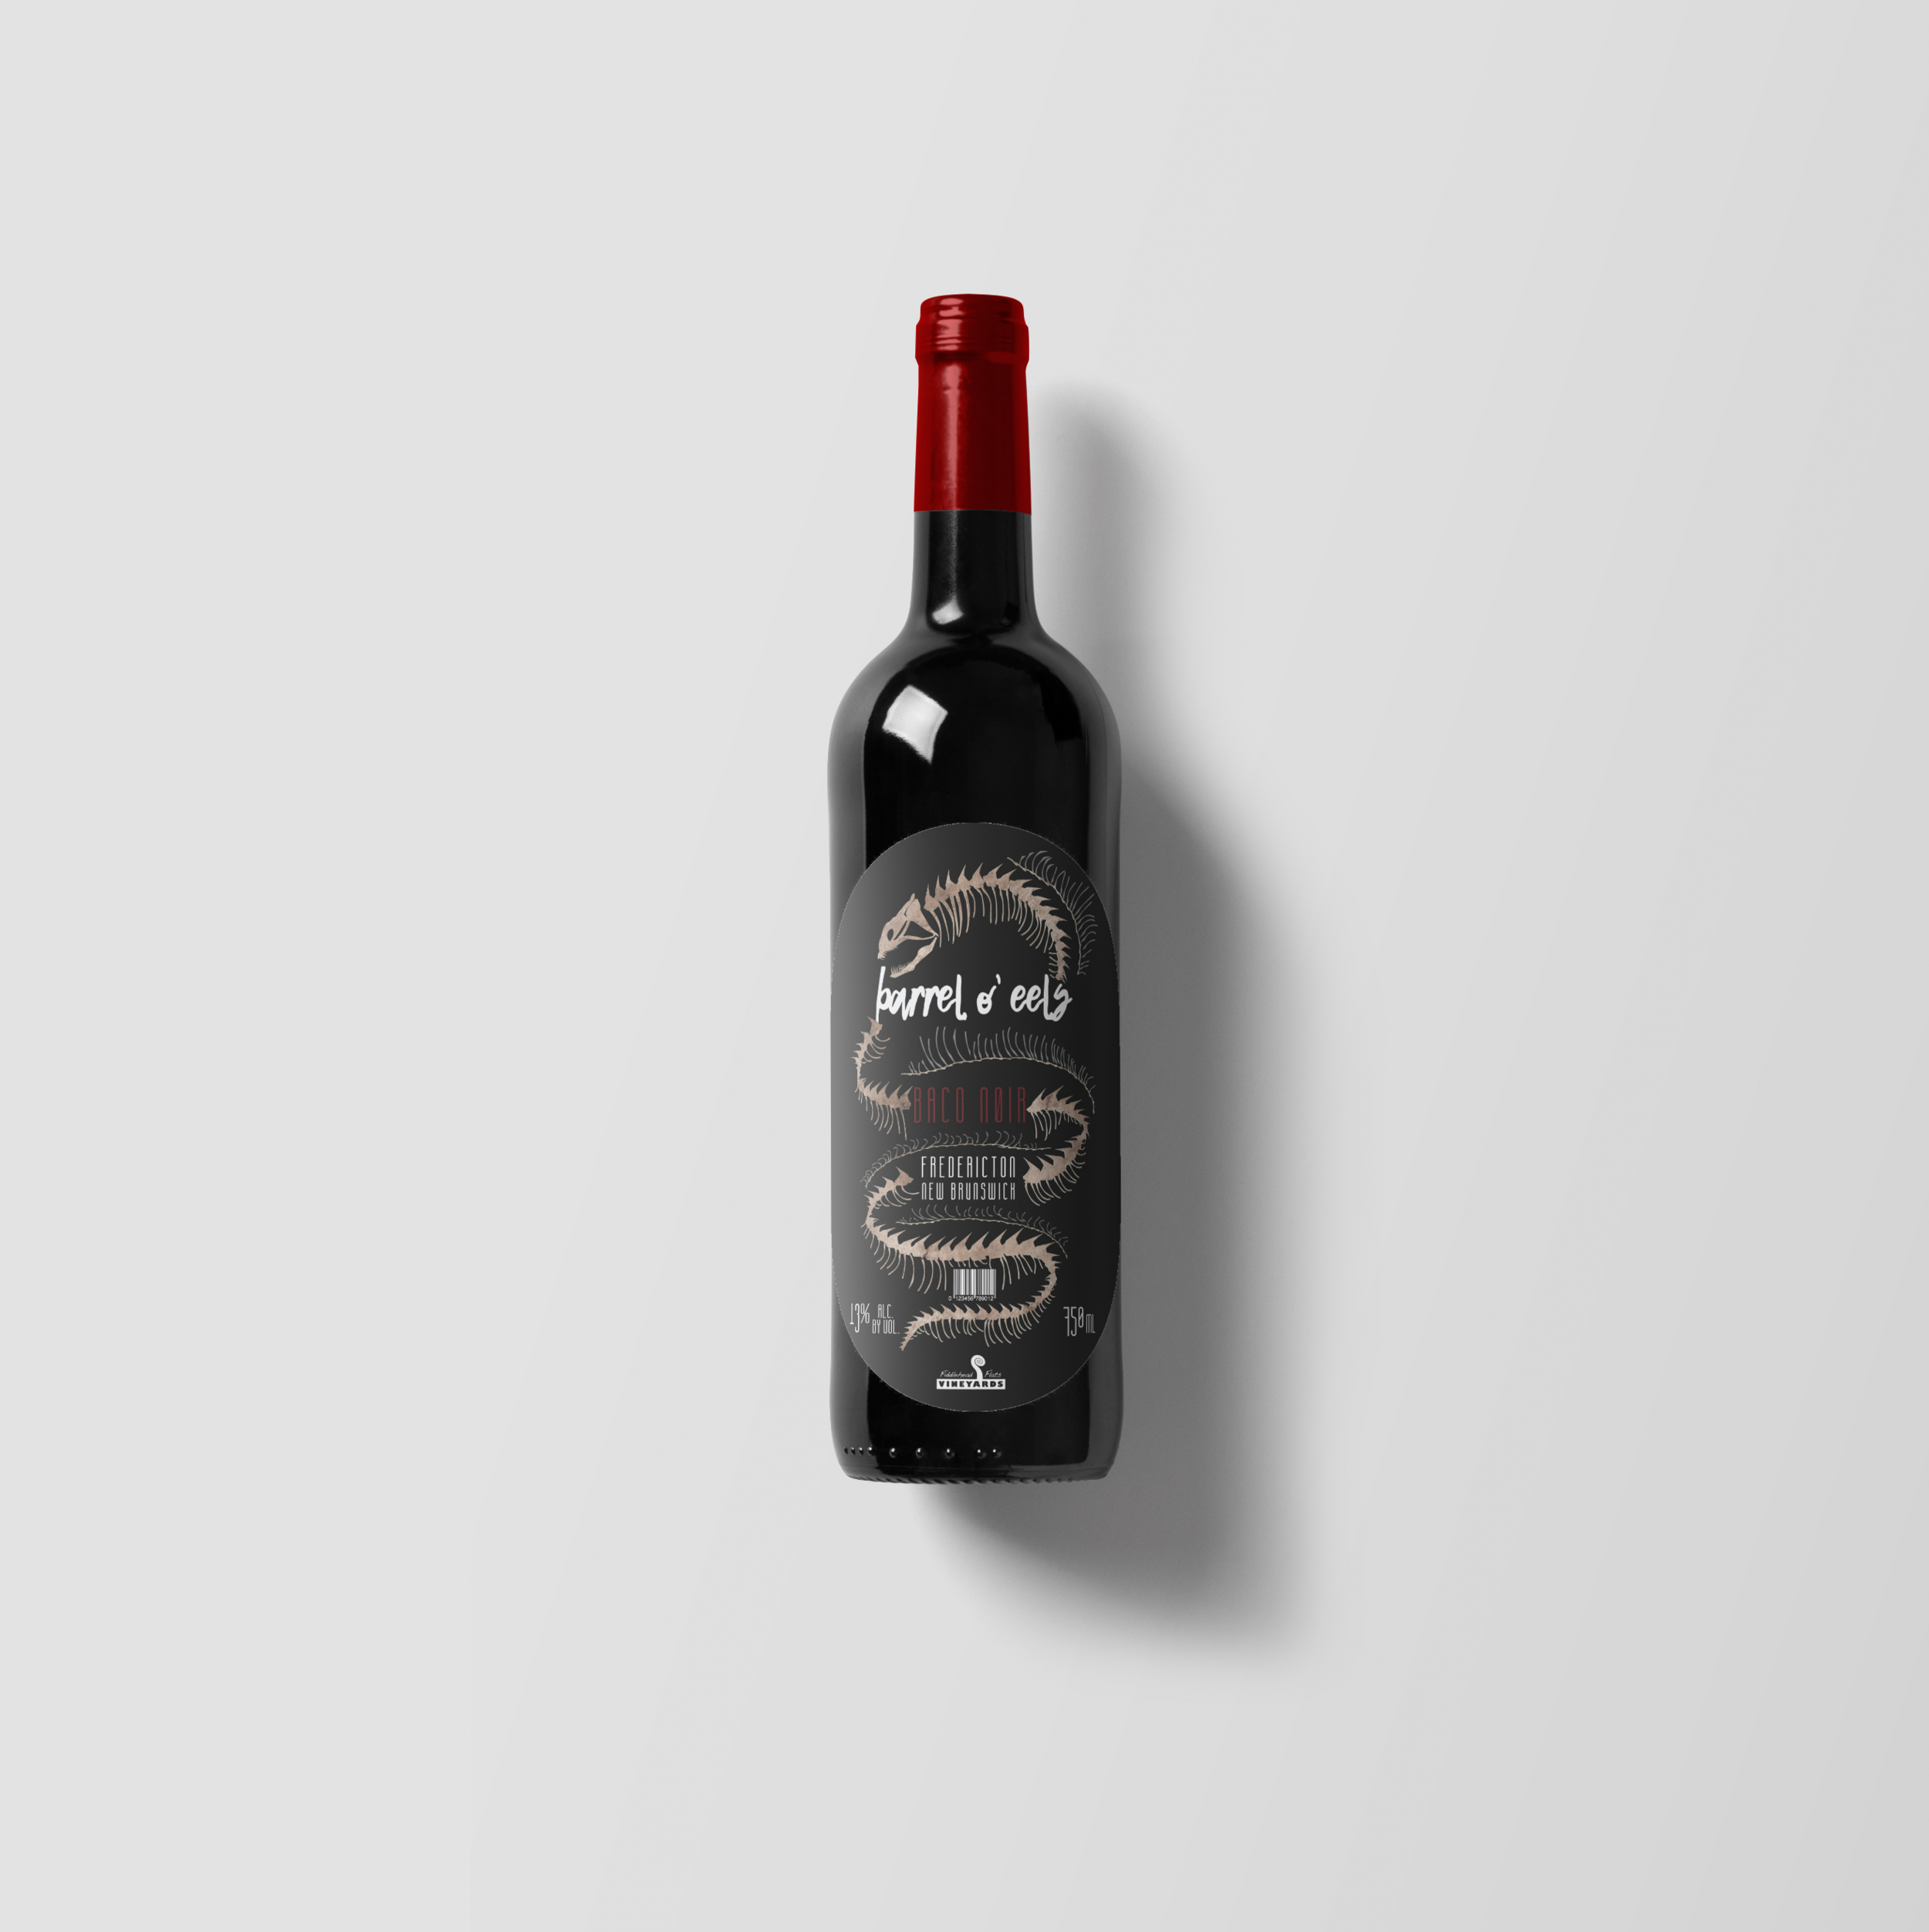 wine label - Barrel O' Eels   A fictional wine brand